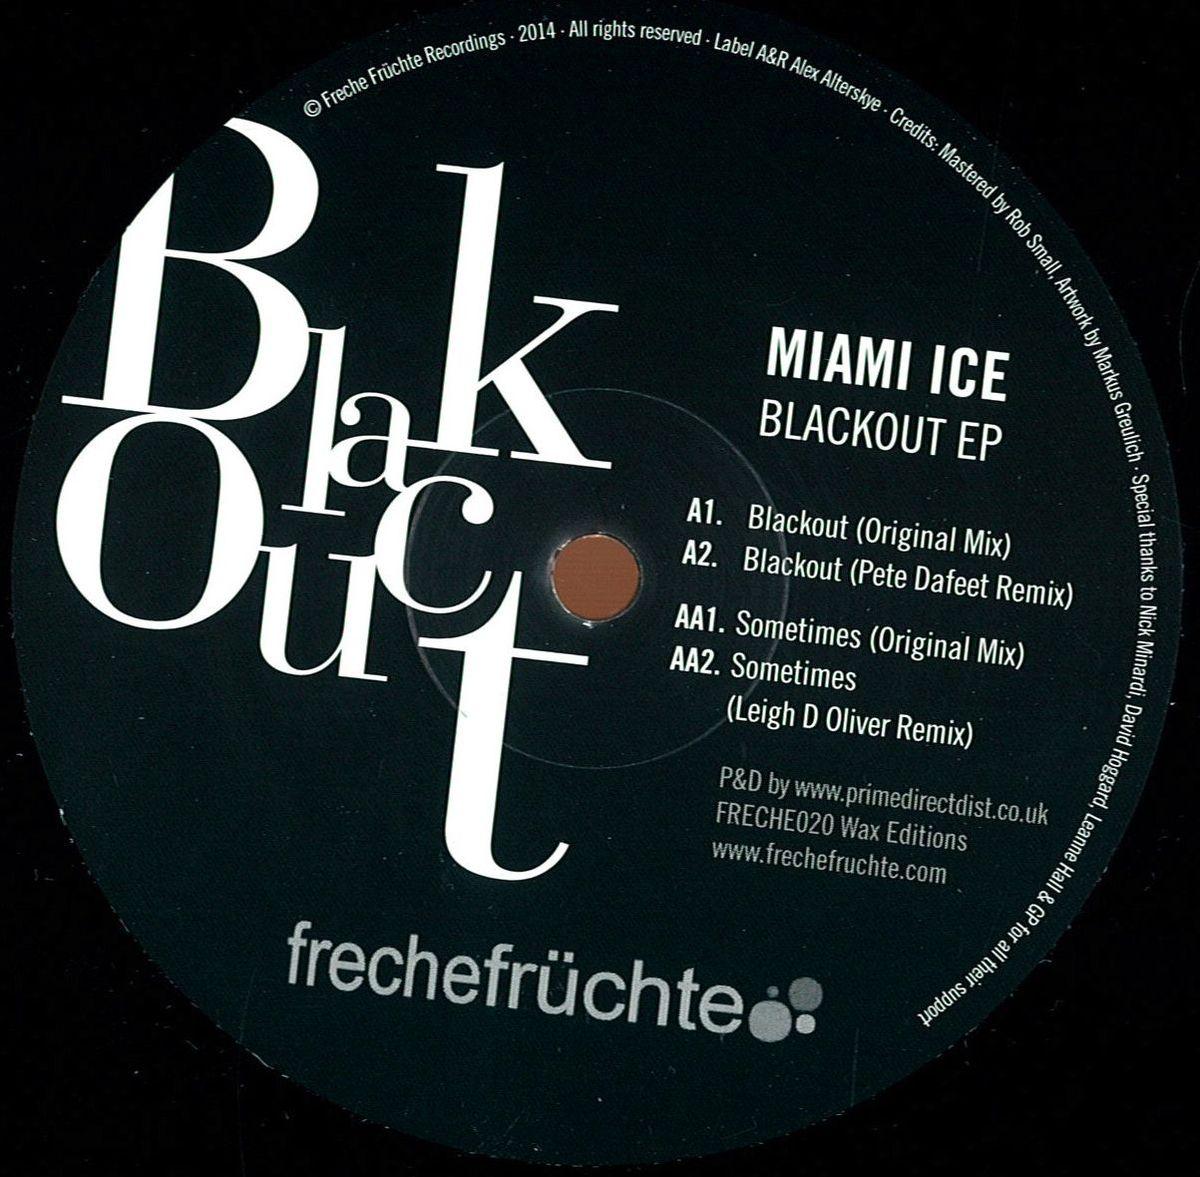 miami ice blackout ep frech fr chte freche020 vinyl. Black Bedroom Furniture Sets. Home Design Ideas